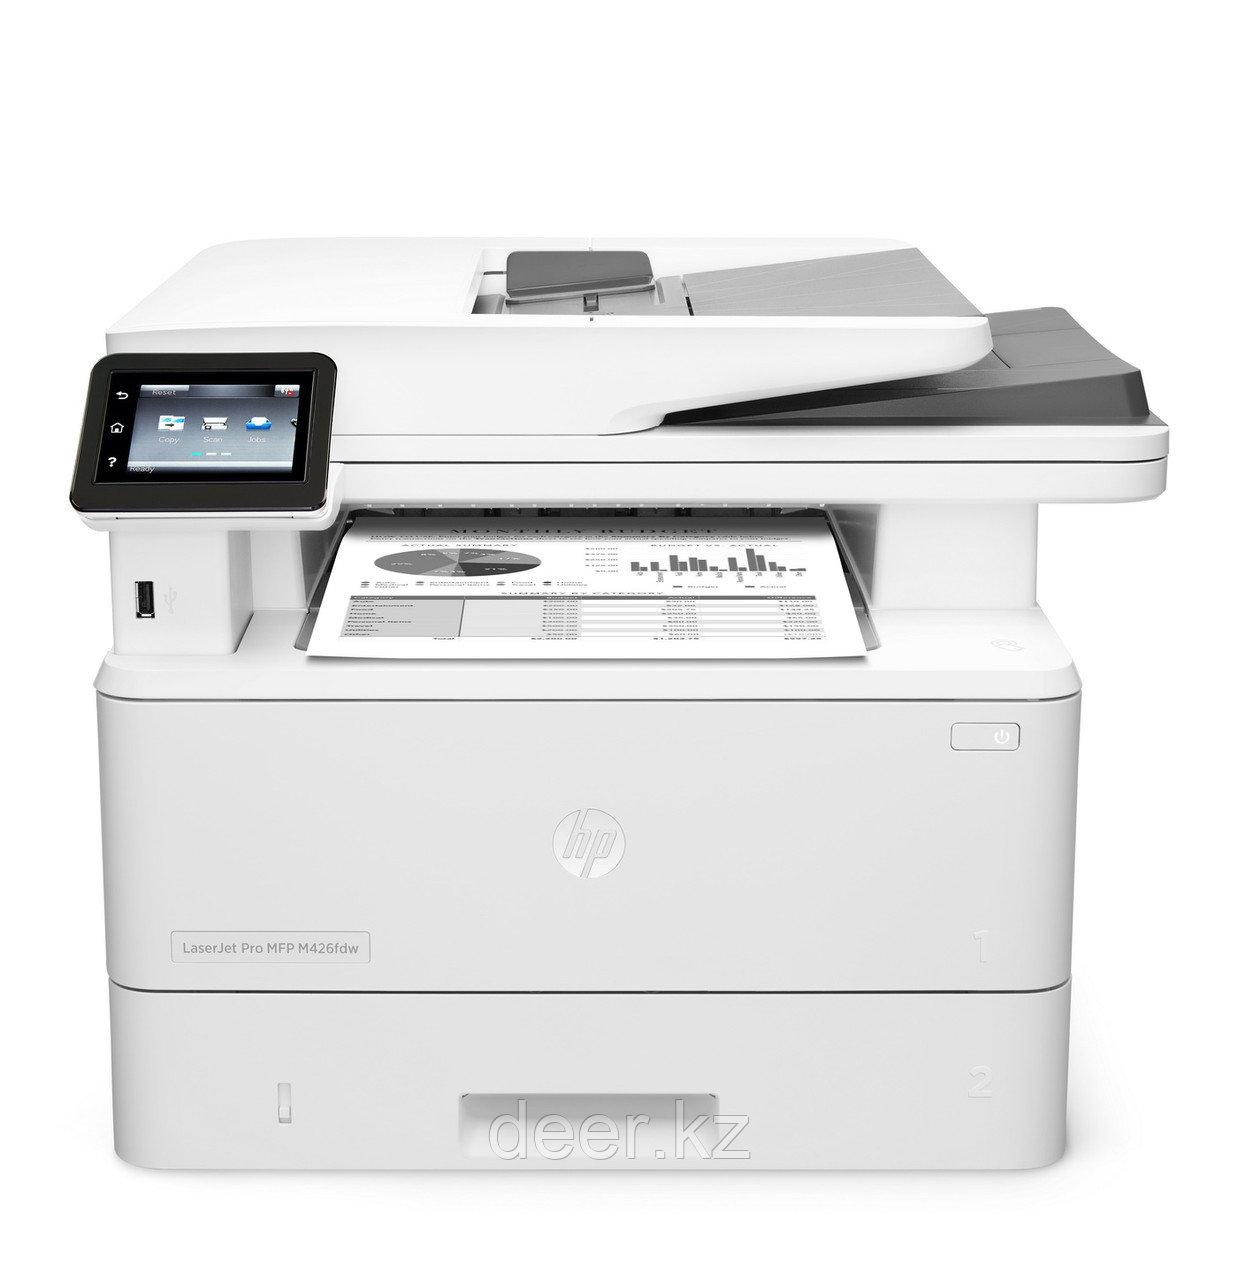 МФУ HP LaserJet Pro MFP M426fdw F6W15A, USB, WiFi